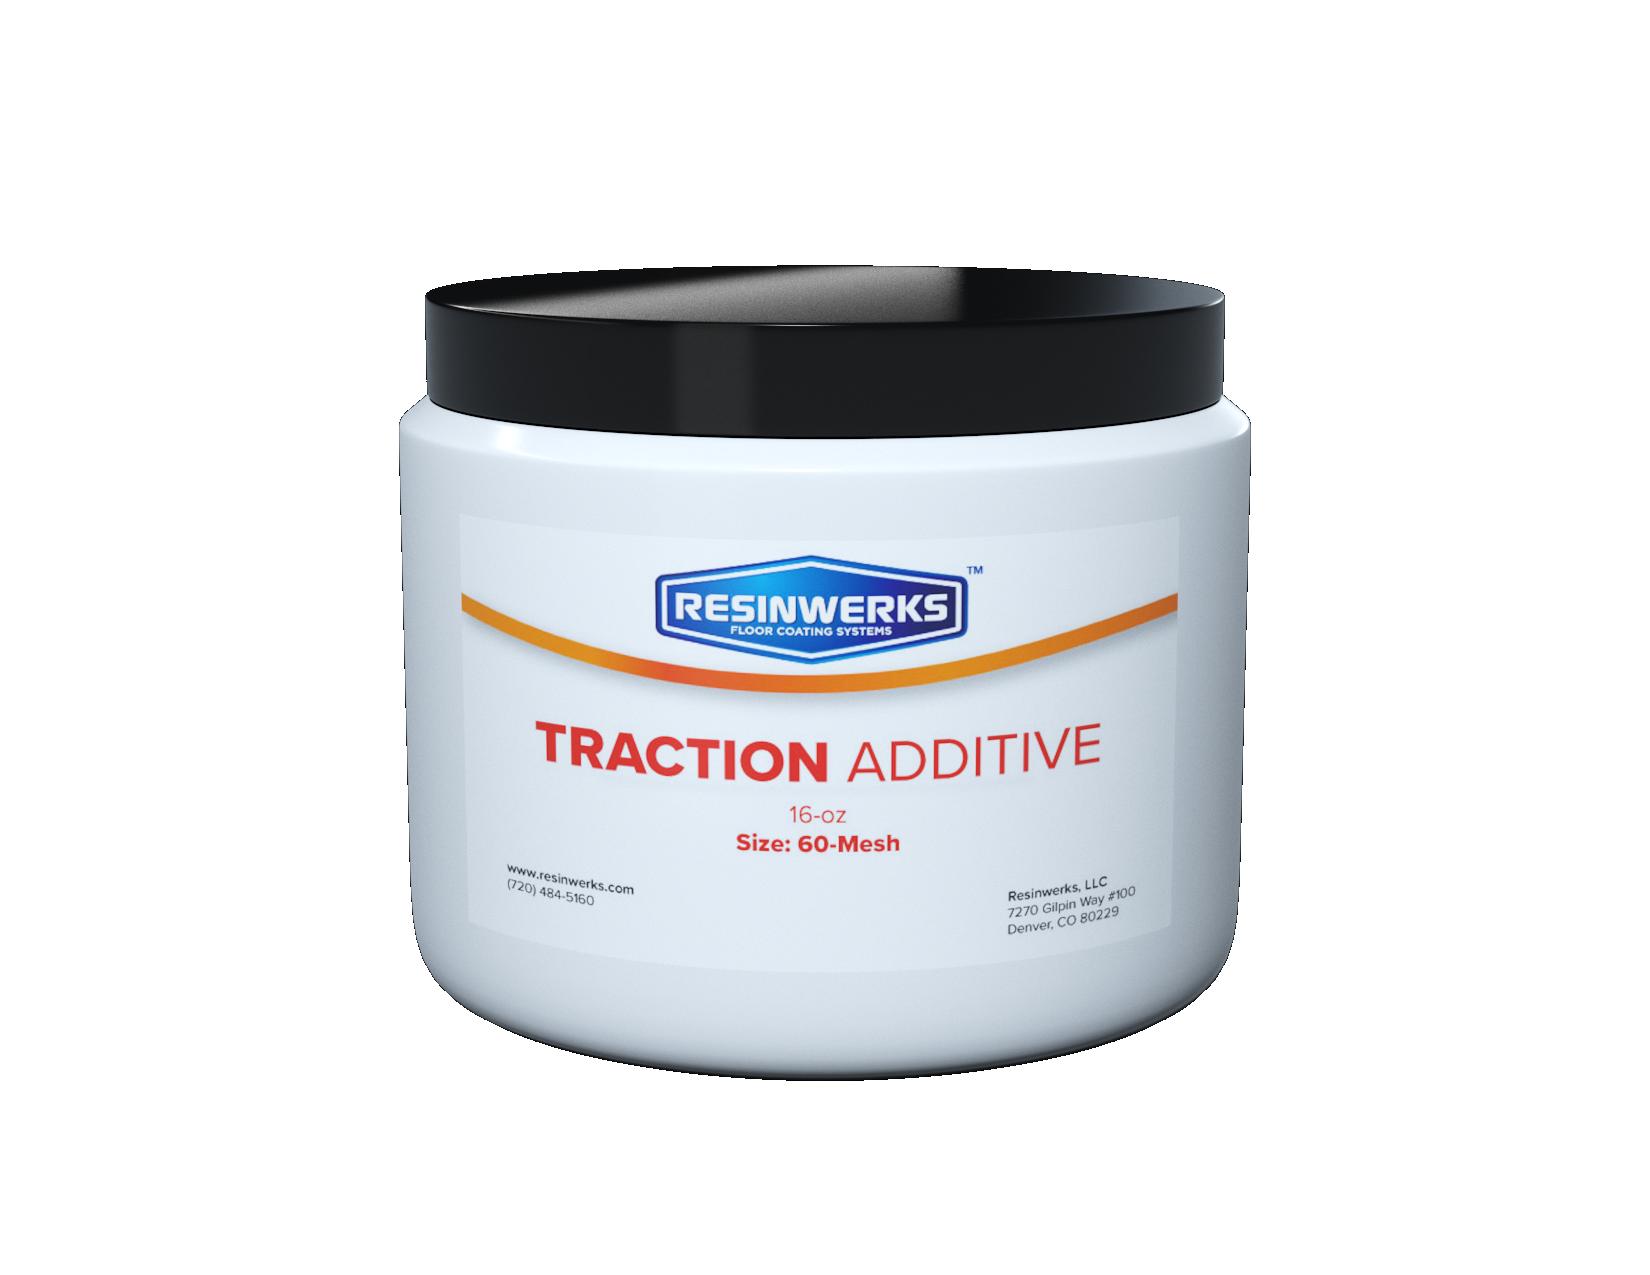 resinwerks_label_traction_2000x